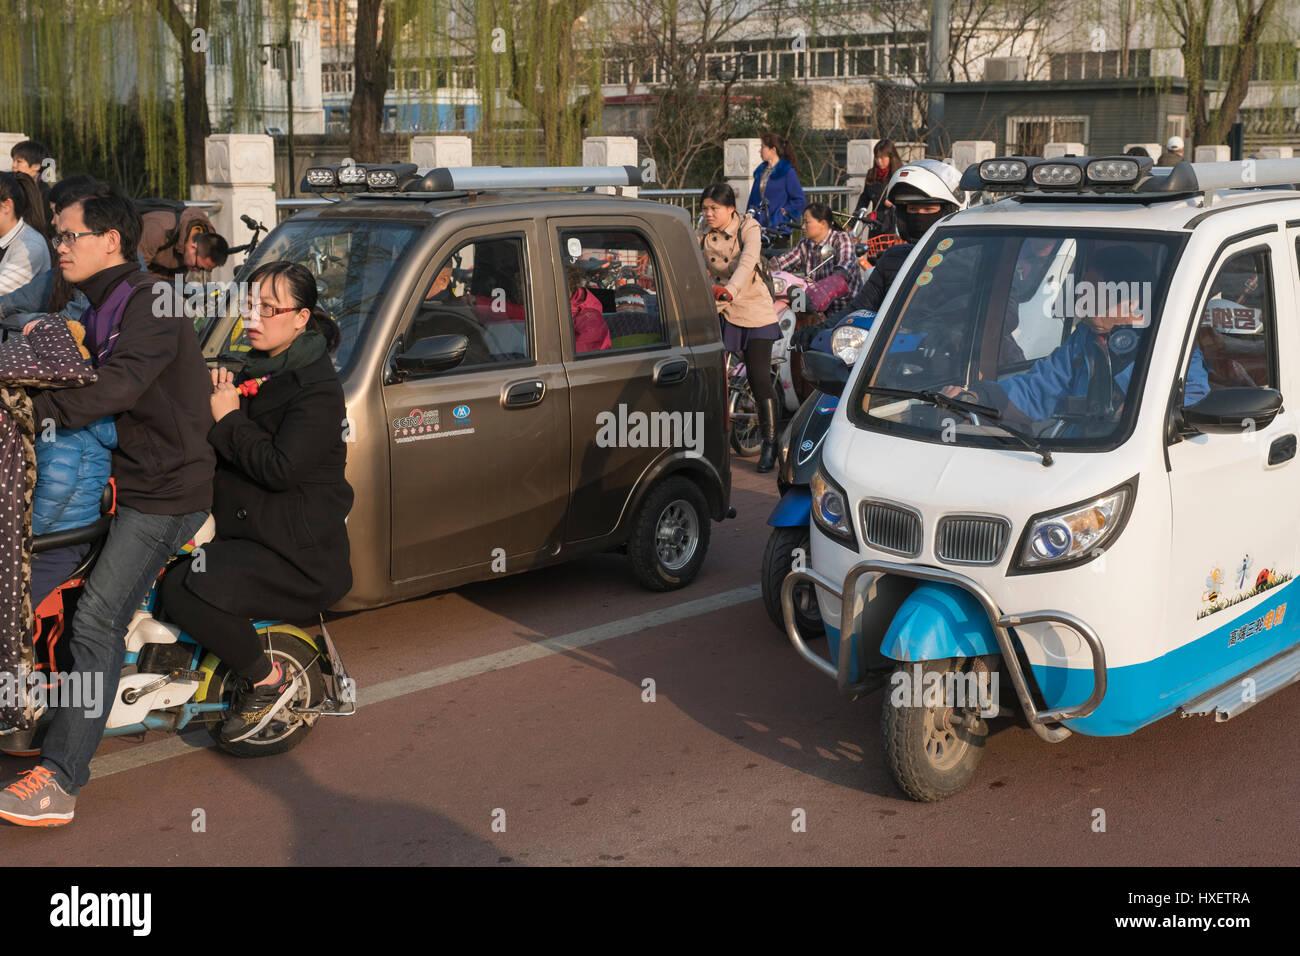 Nicht lizenzierte Mini-Elektro-Autos in Peking, China. 28. März 2017 Stockbild